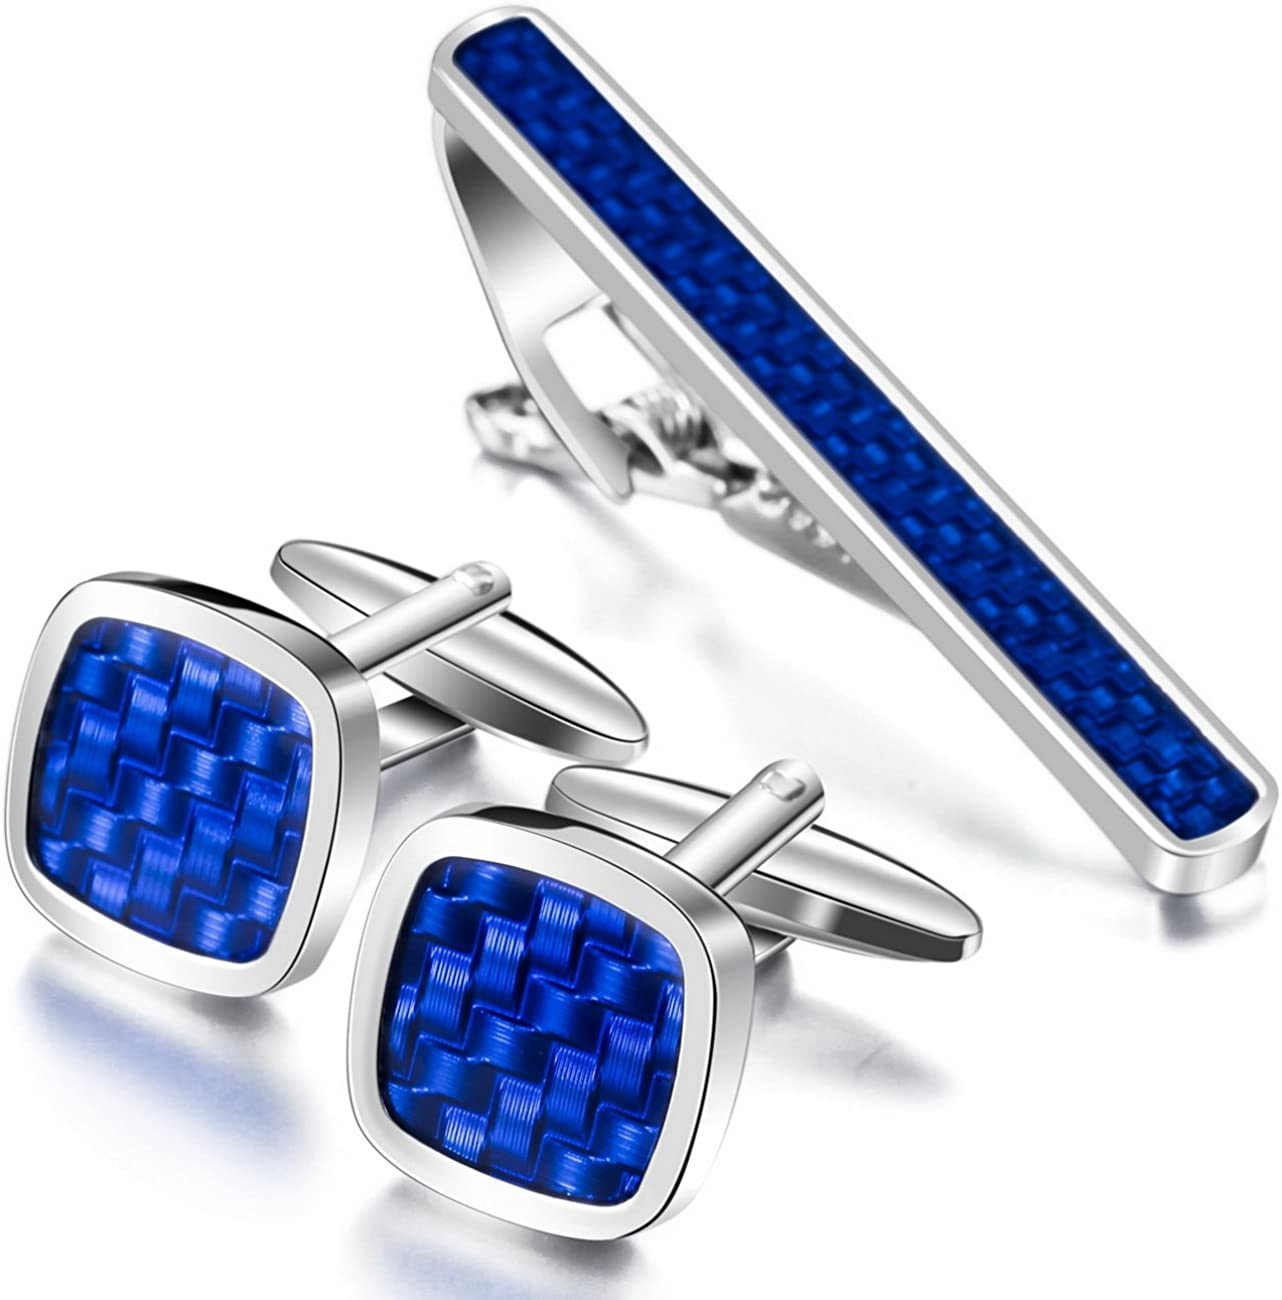 MOWOM Silver Tone Blue Black Rhodium Plated Carbon Fiber Cufflinks & Necktie Tie Clip Bar Set Shirt Wedding